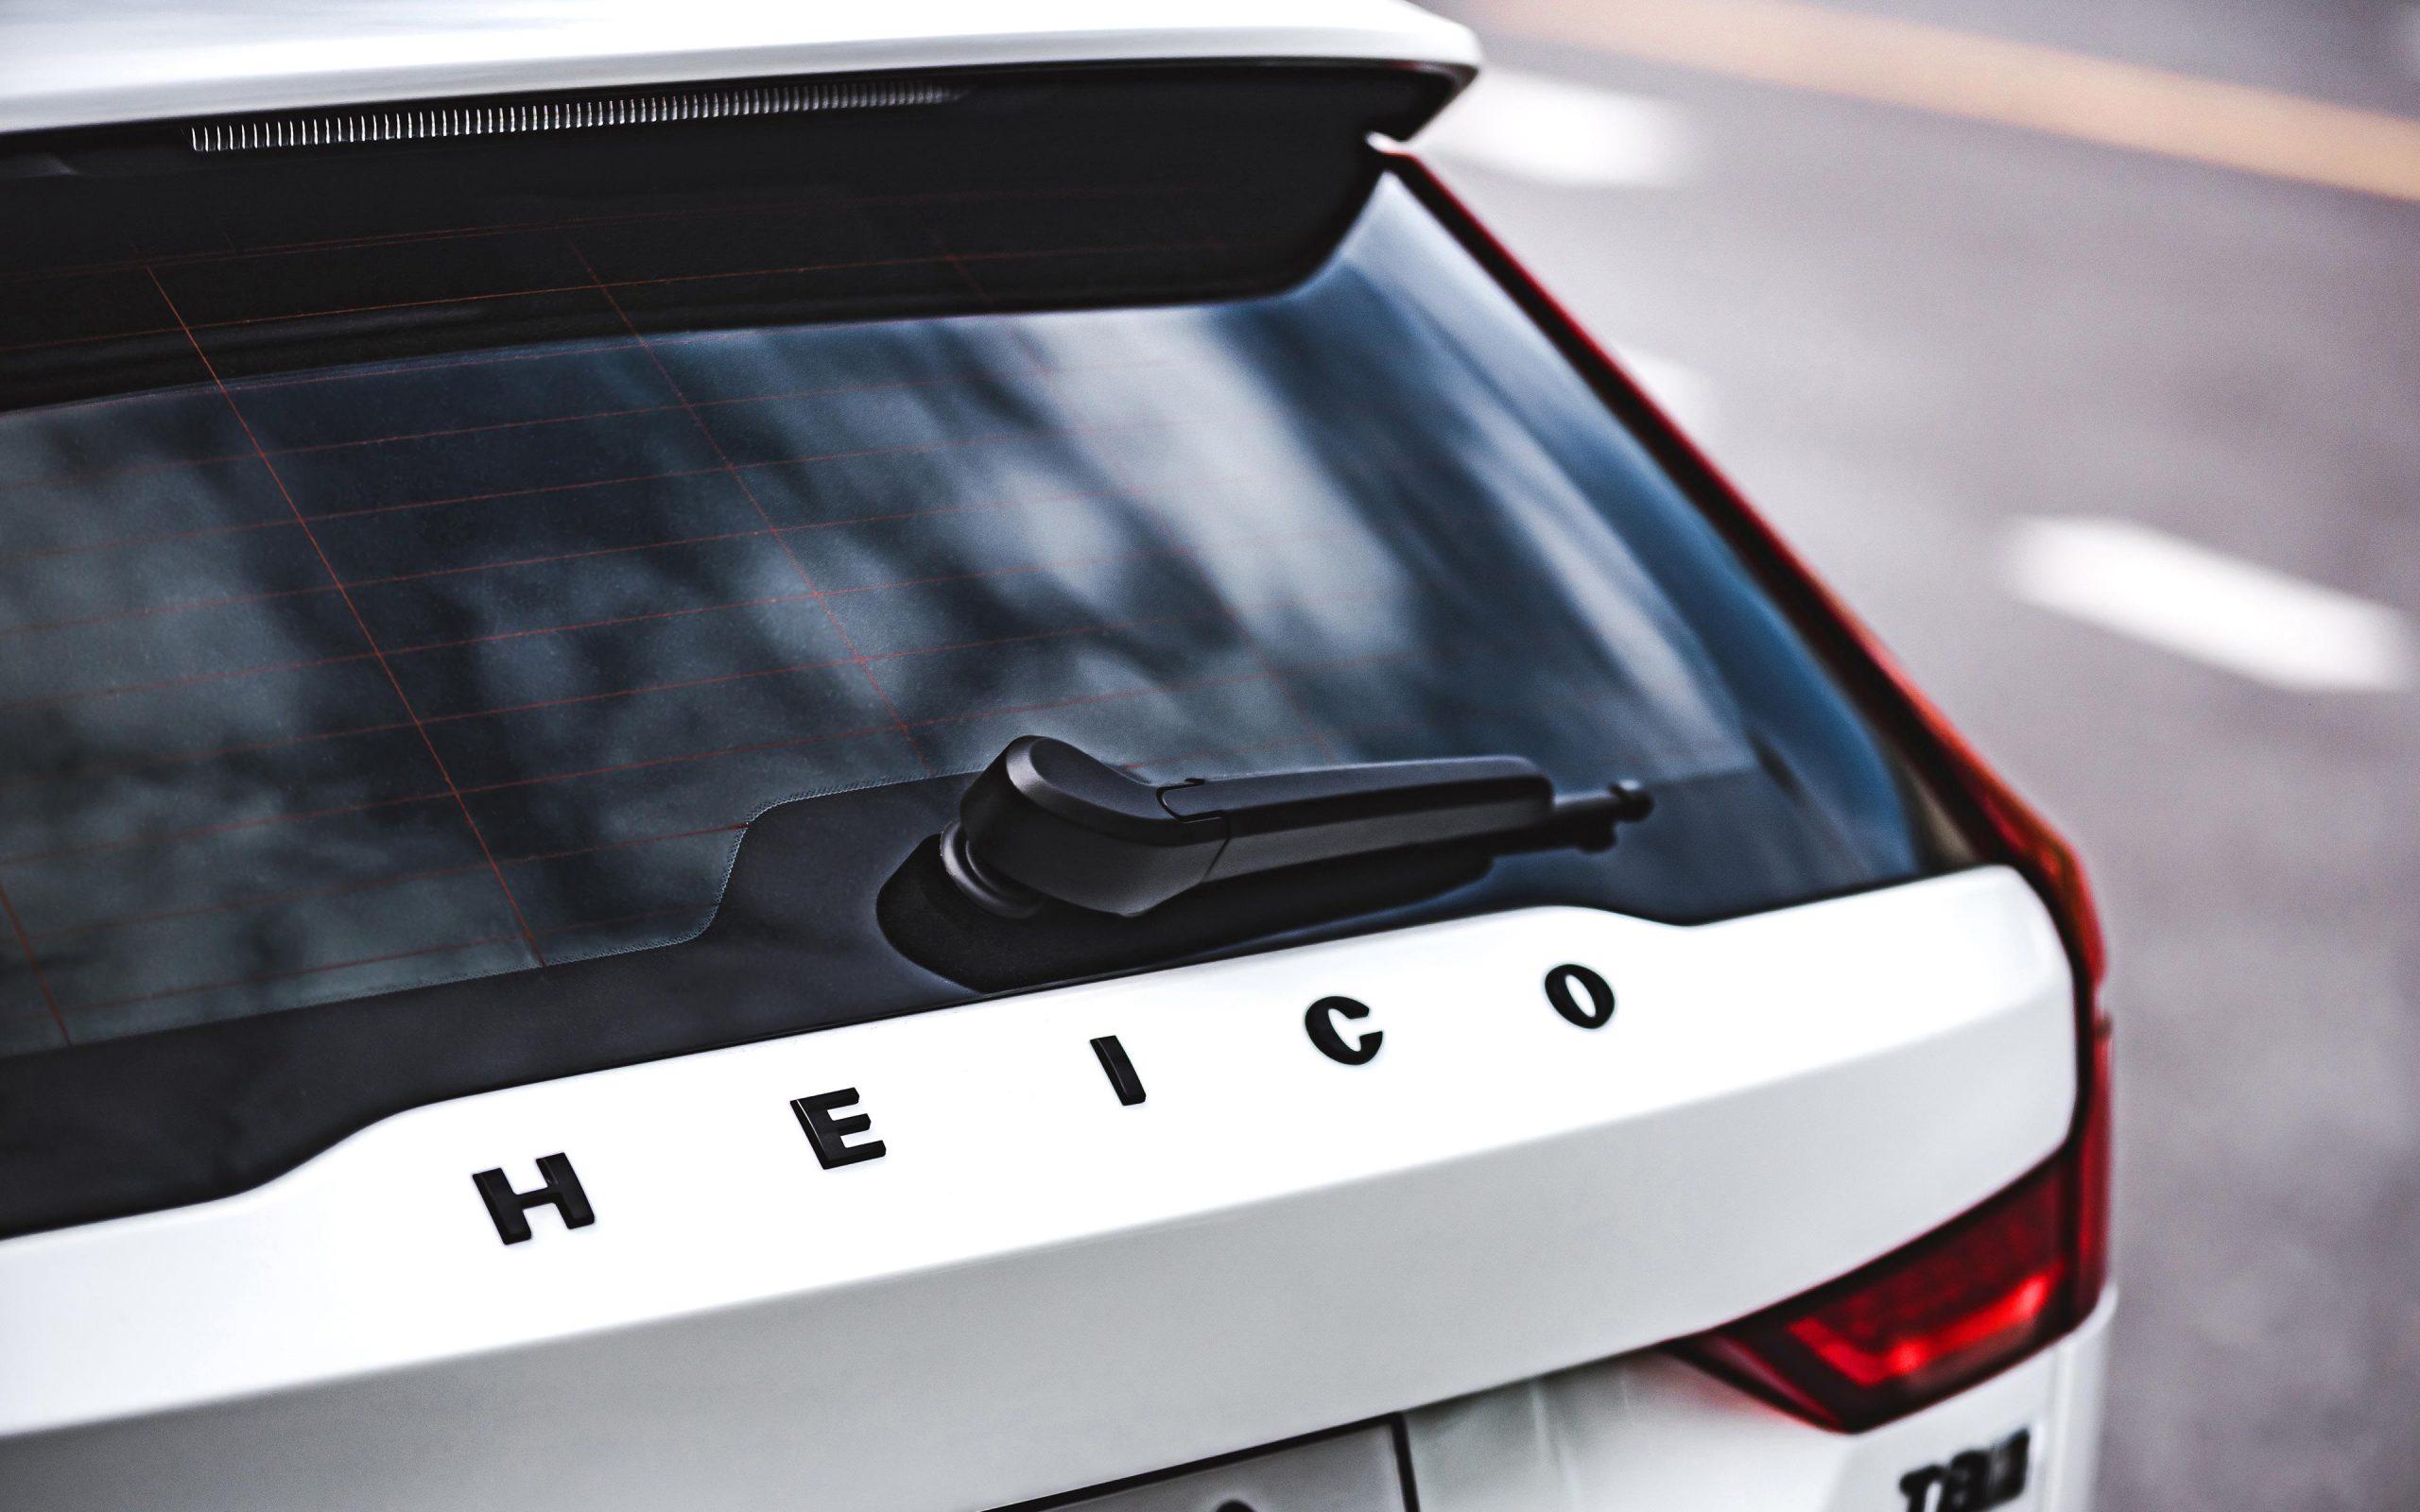 heico-sportiv-v60-225-rear-badge-detail-1